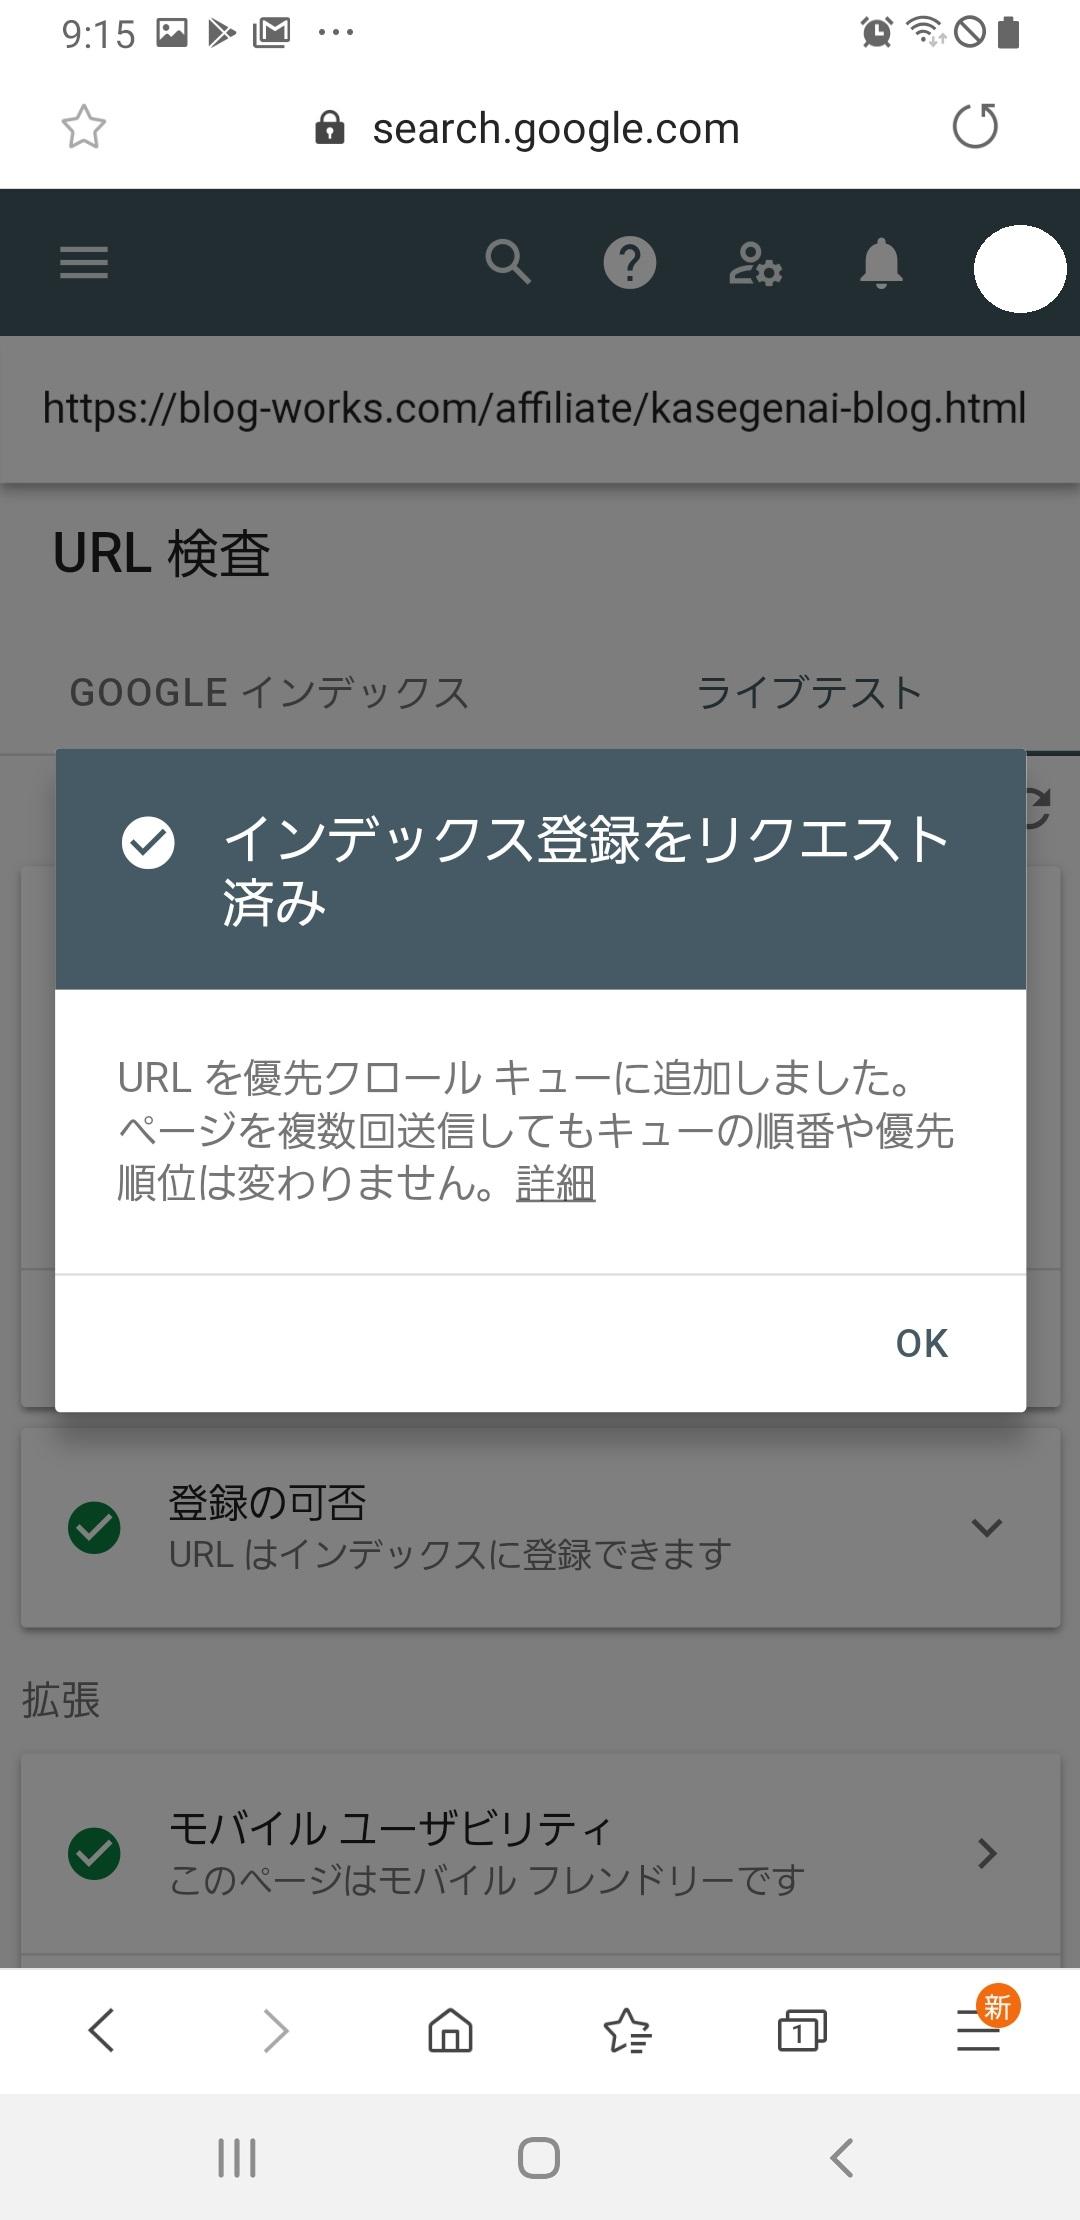 Google Serch Console インデックス登録完了